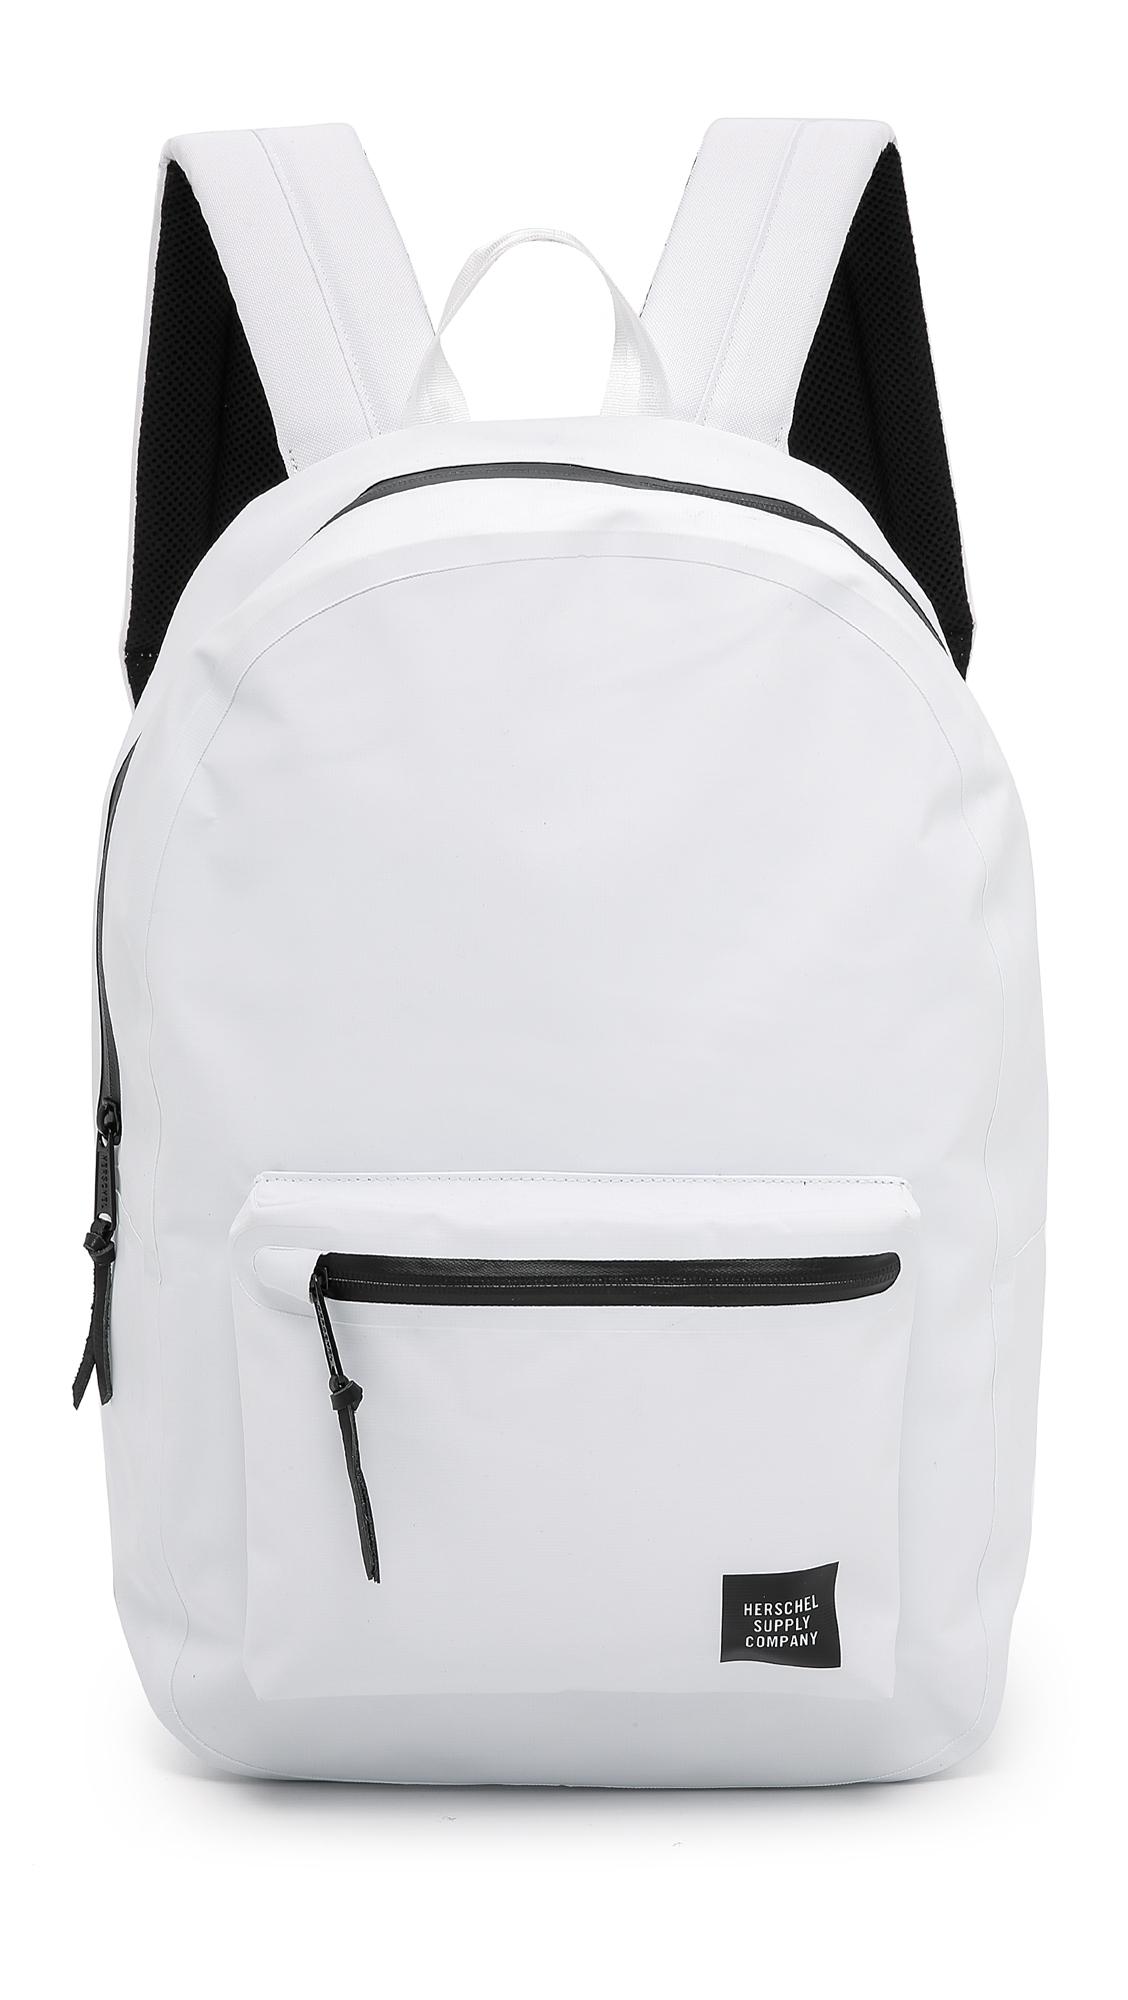 4288189992b ... NBA Superfan Herschel Supply Company online retailer b65ad 20faf  Herschel  Supply Co. Studio Settlement Backpack in White for best cheap 3917c f00aa  ...